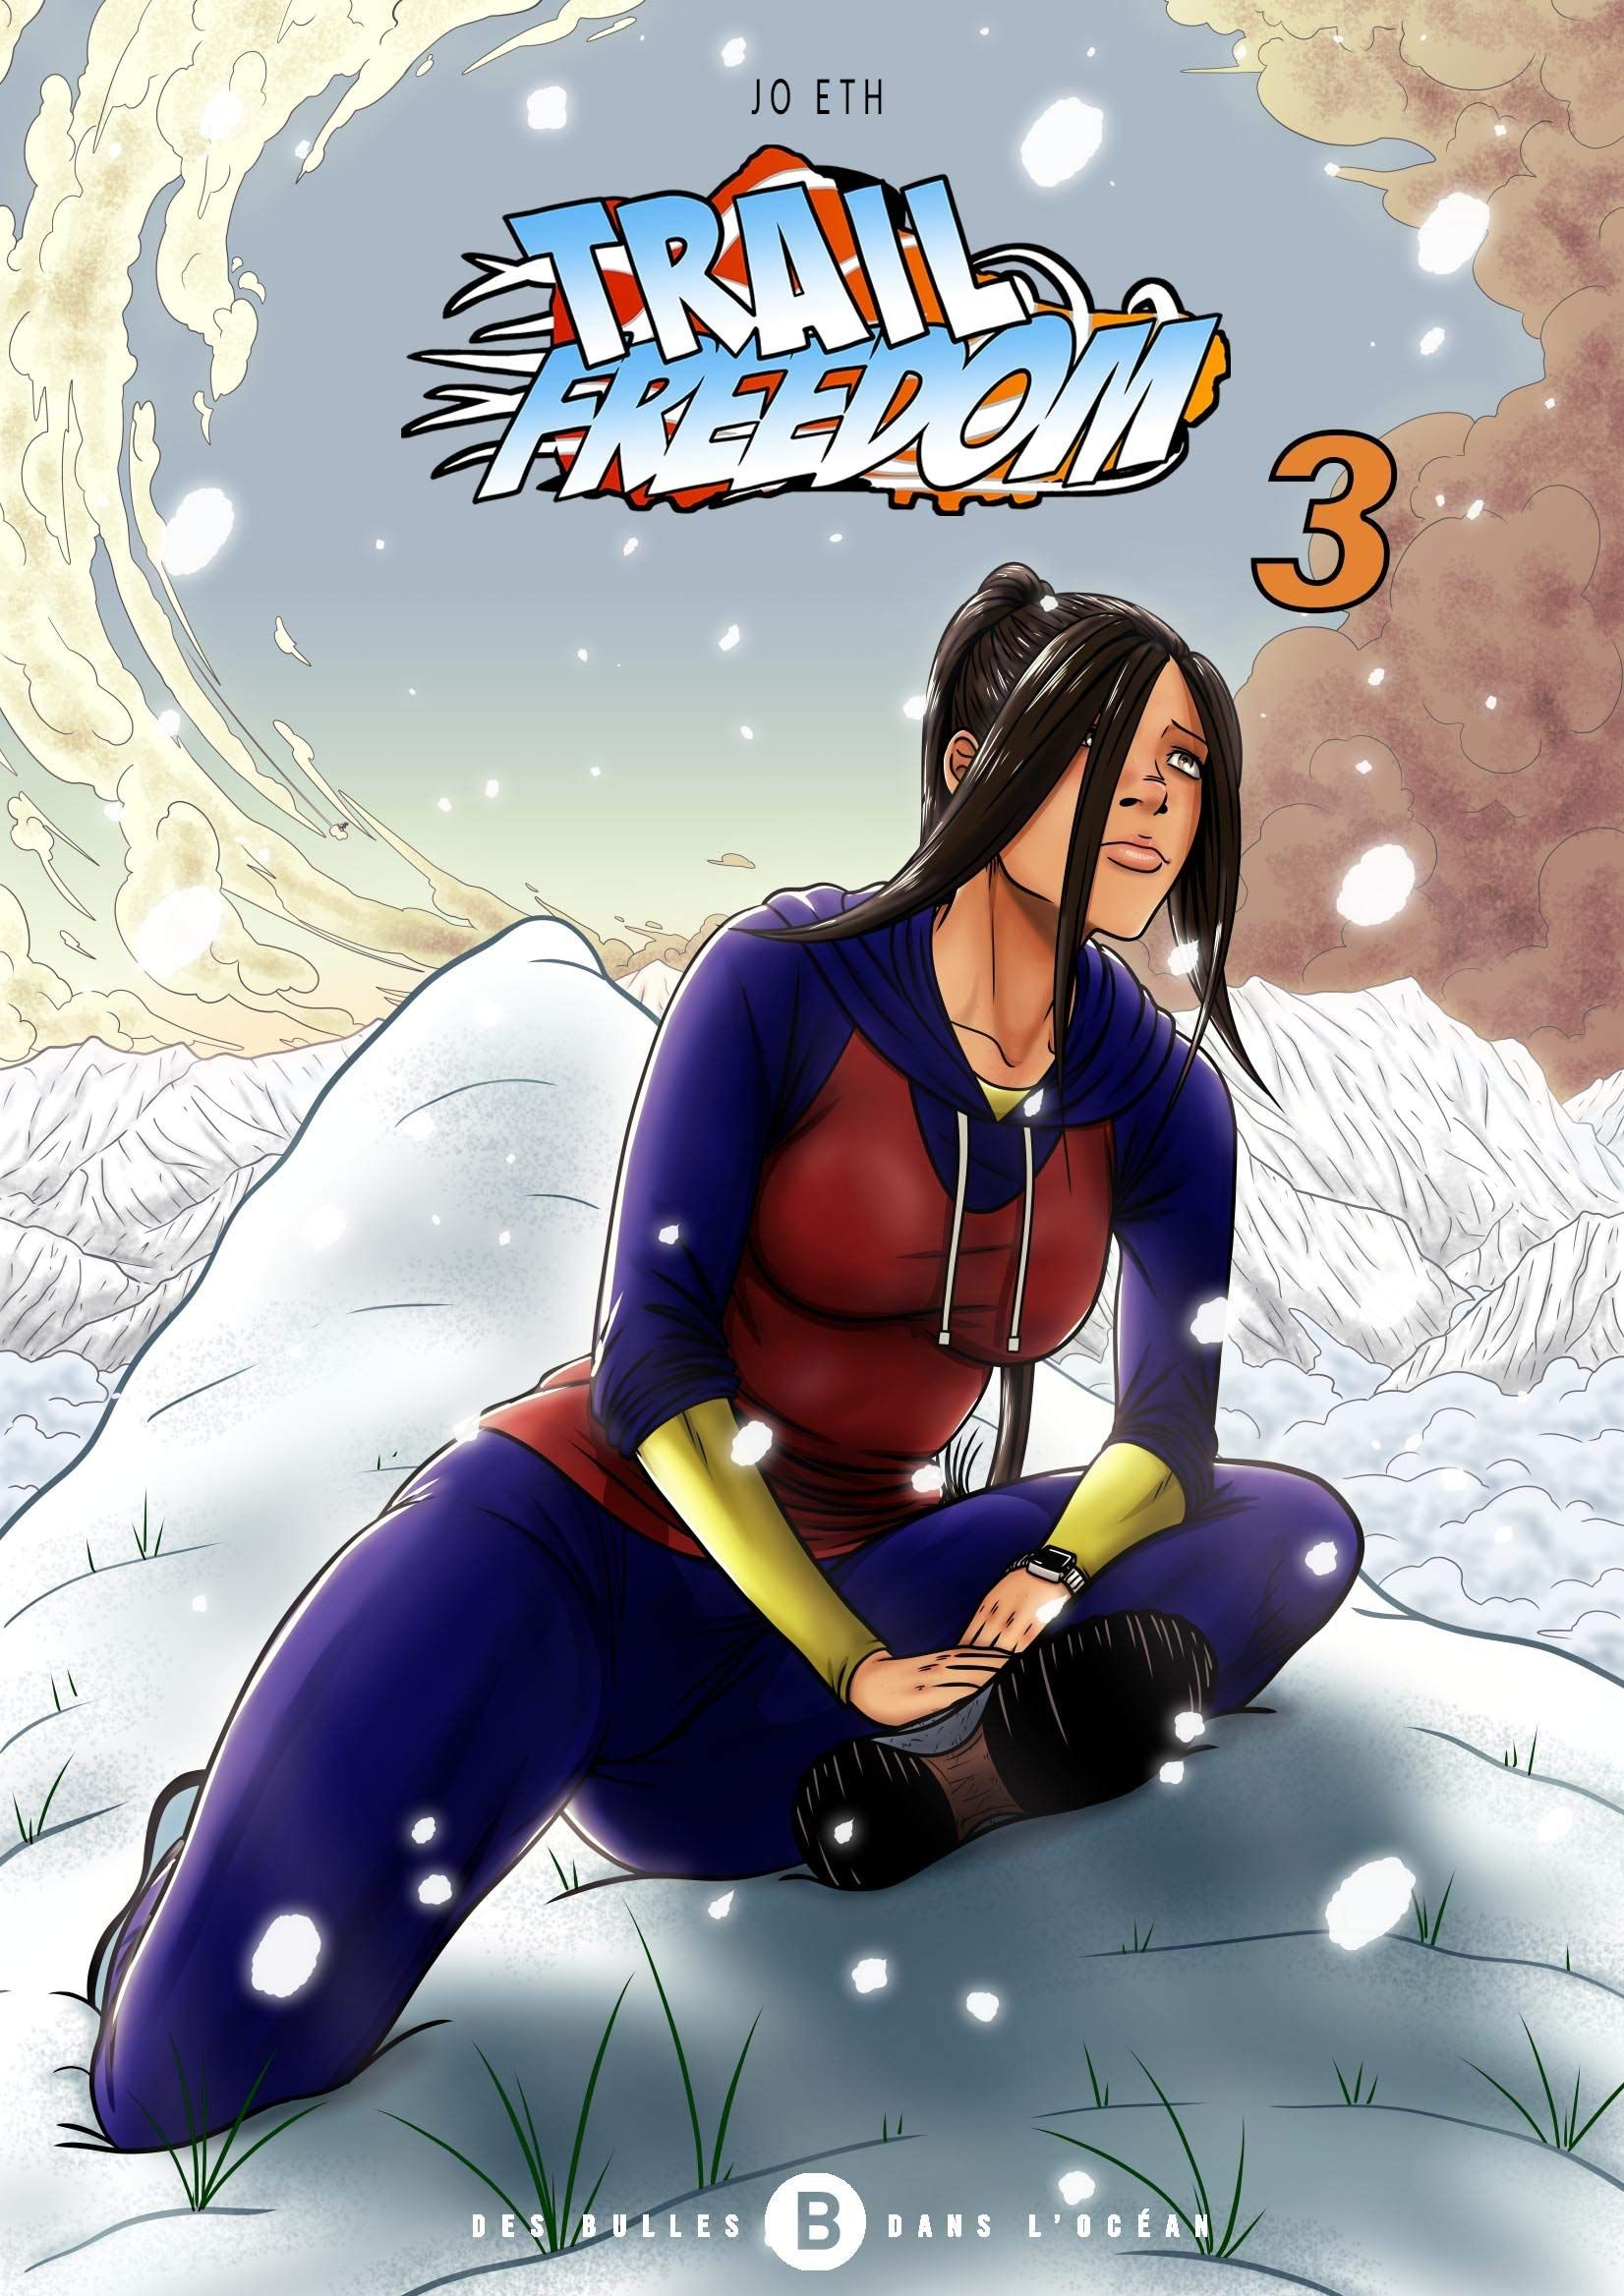 Sortie Manga au Québec MAI 2021 Trail-freedon-3-rond-o